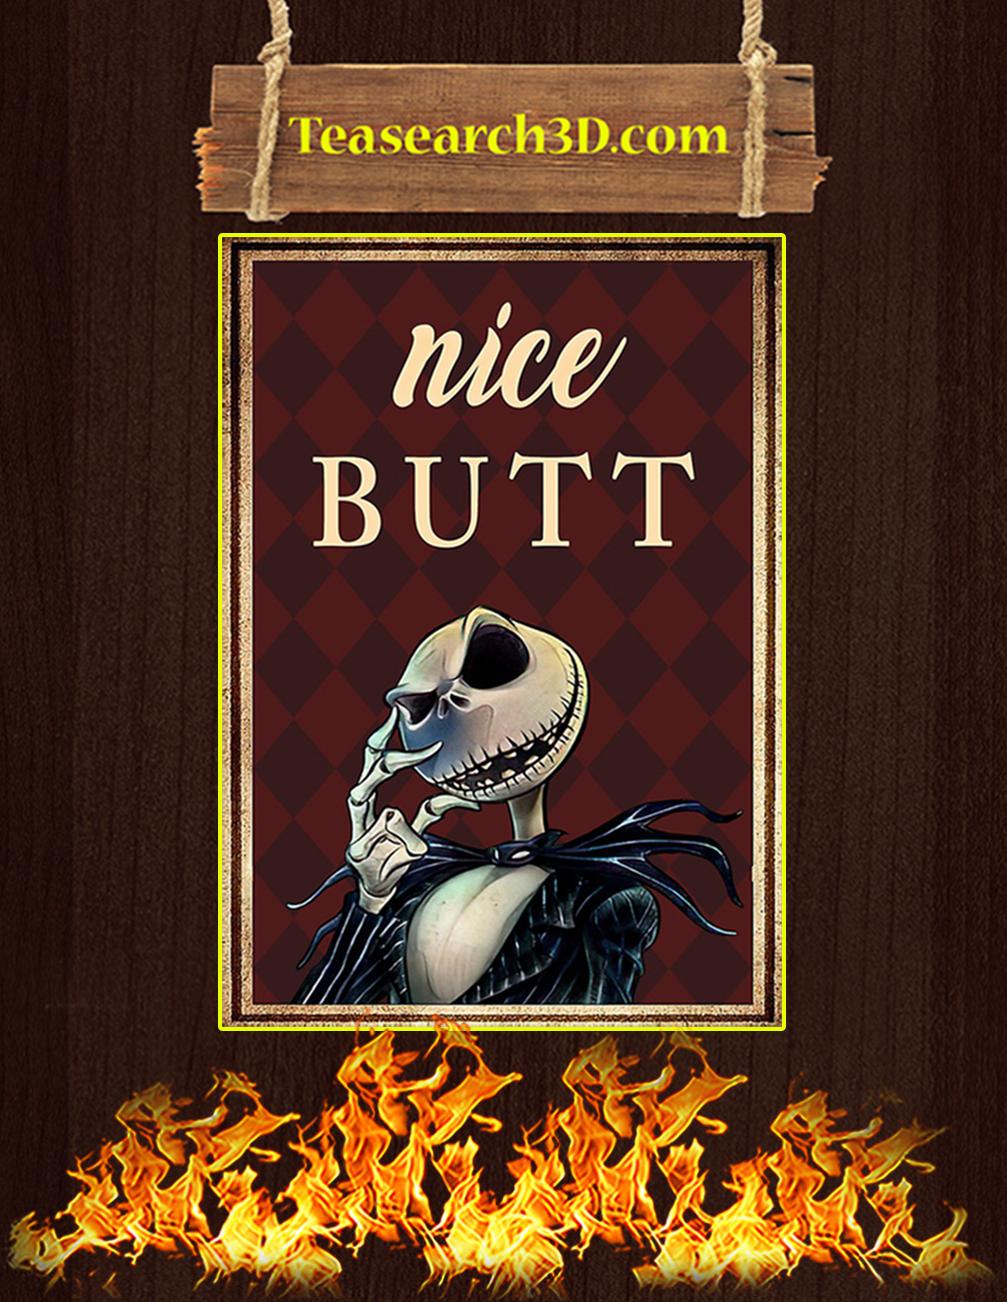 Jack skellington nice butt poster